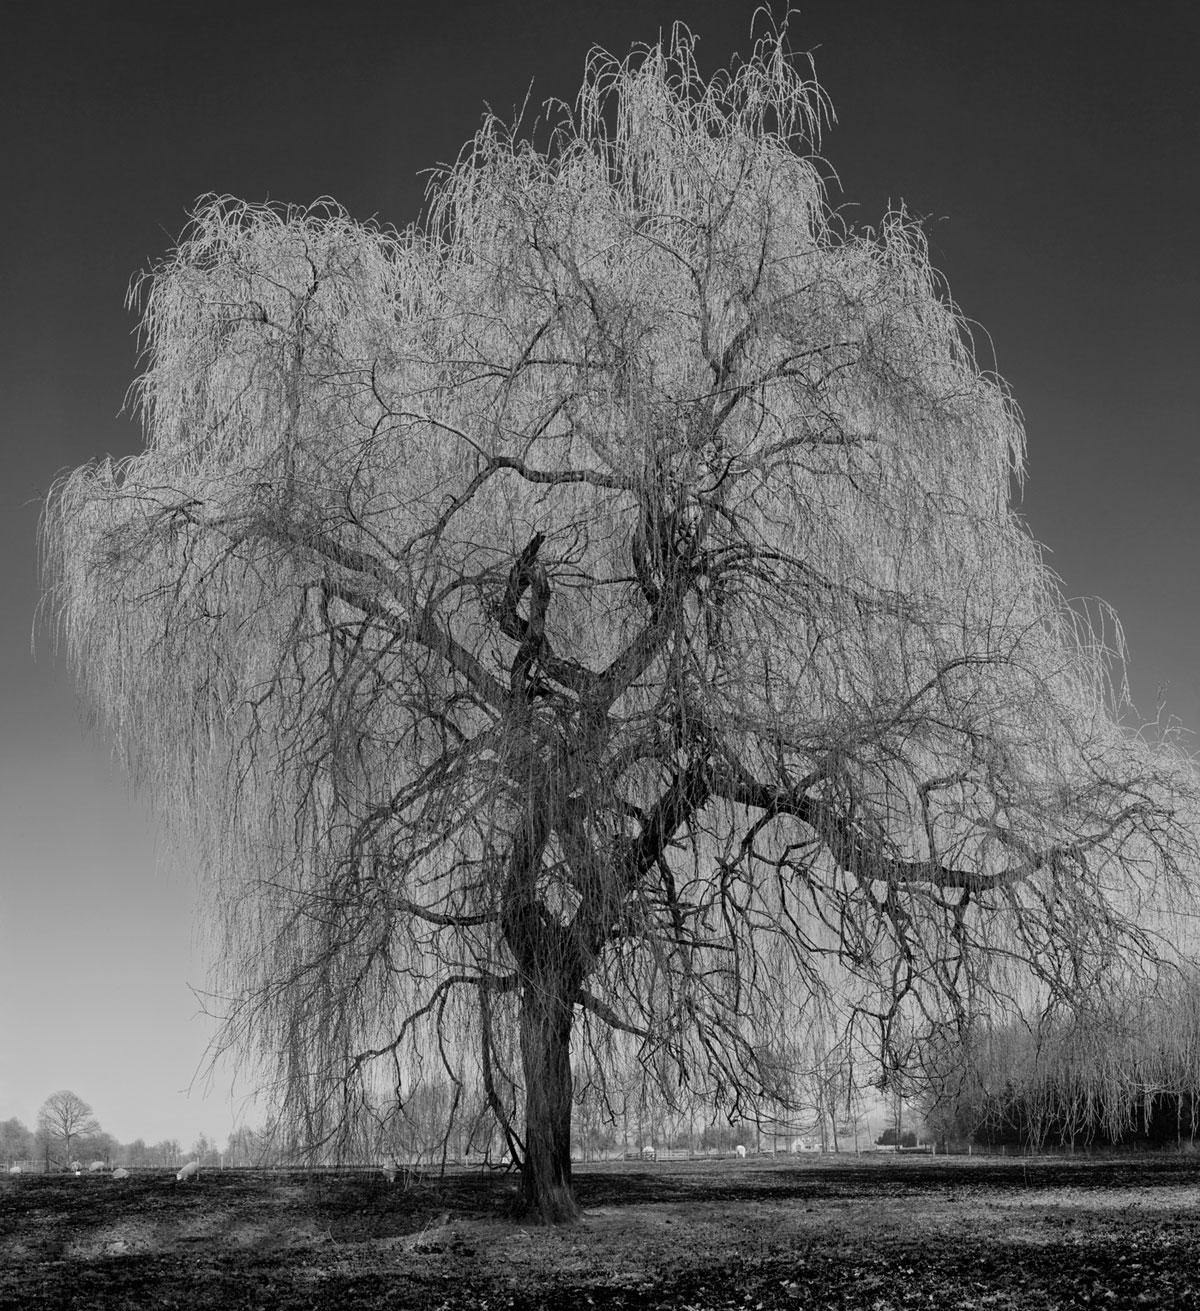 Serenety Willow